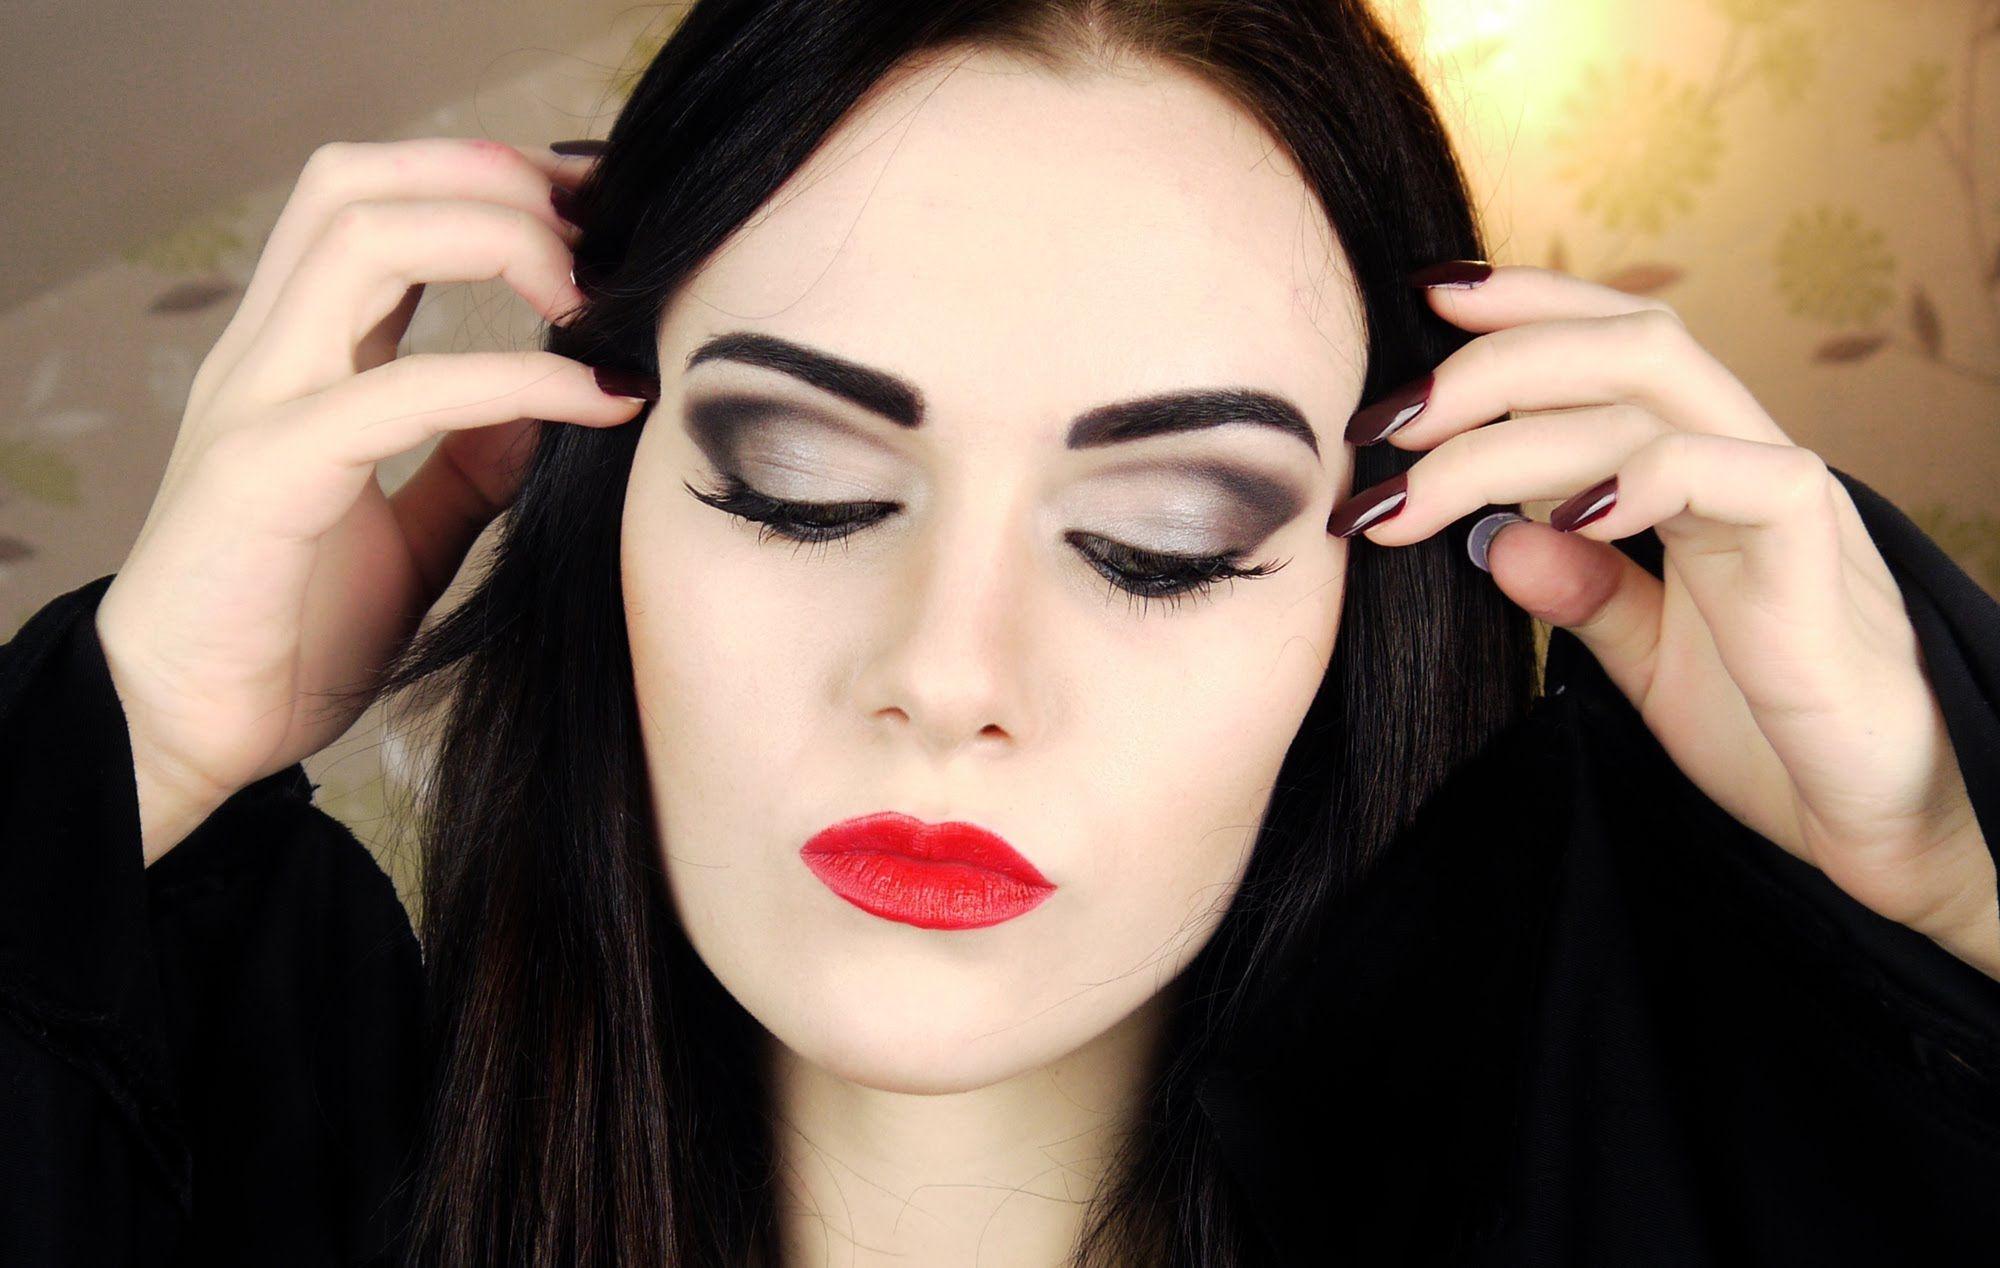 morticia addams makeup tutorial beauty diy makeup pinterest maquillage fete halloween et. Black Bedroom Furniture Sets. Home Design Ideas